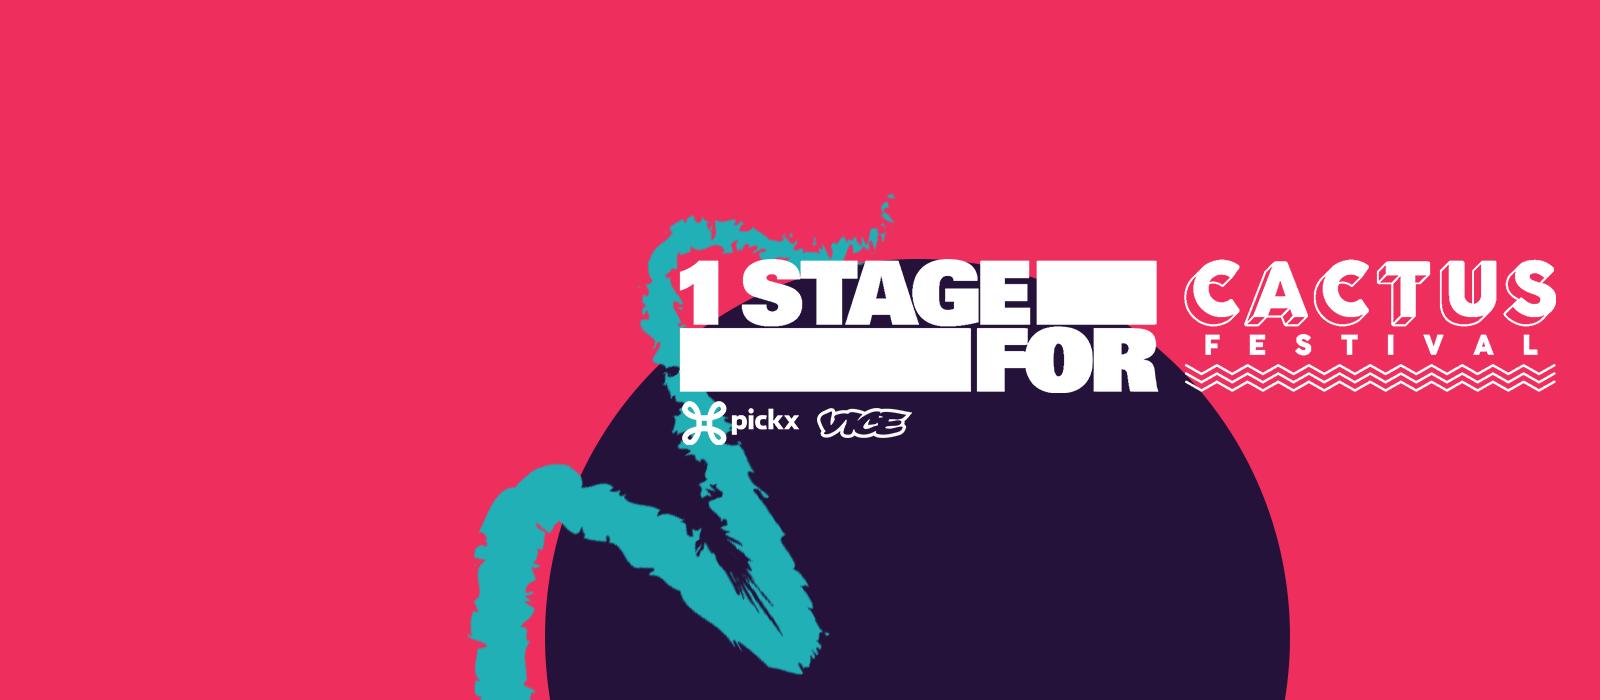 6 festivals, 6 lieux, 18 artistes